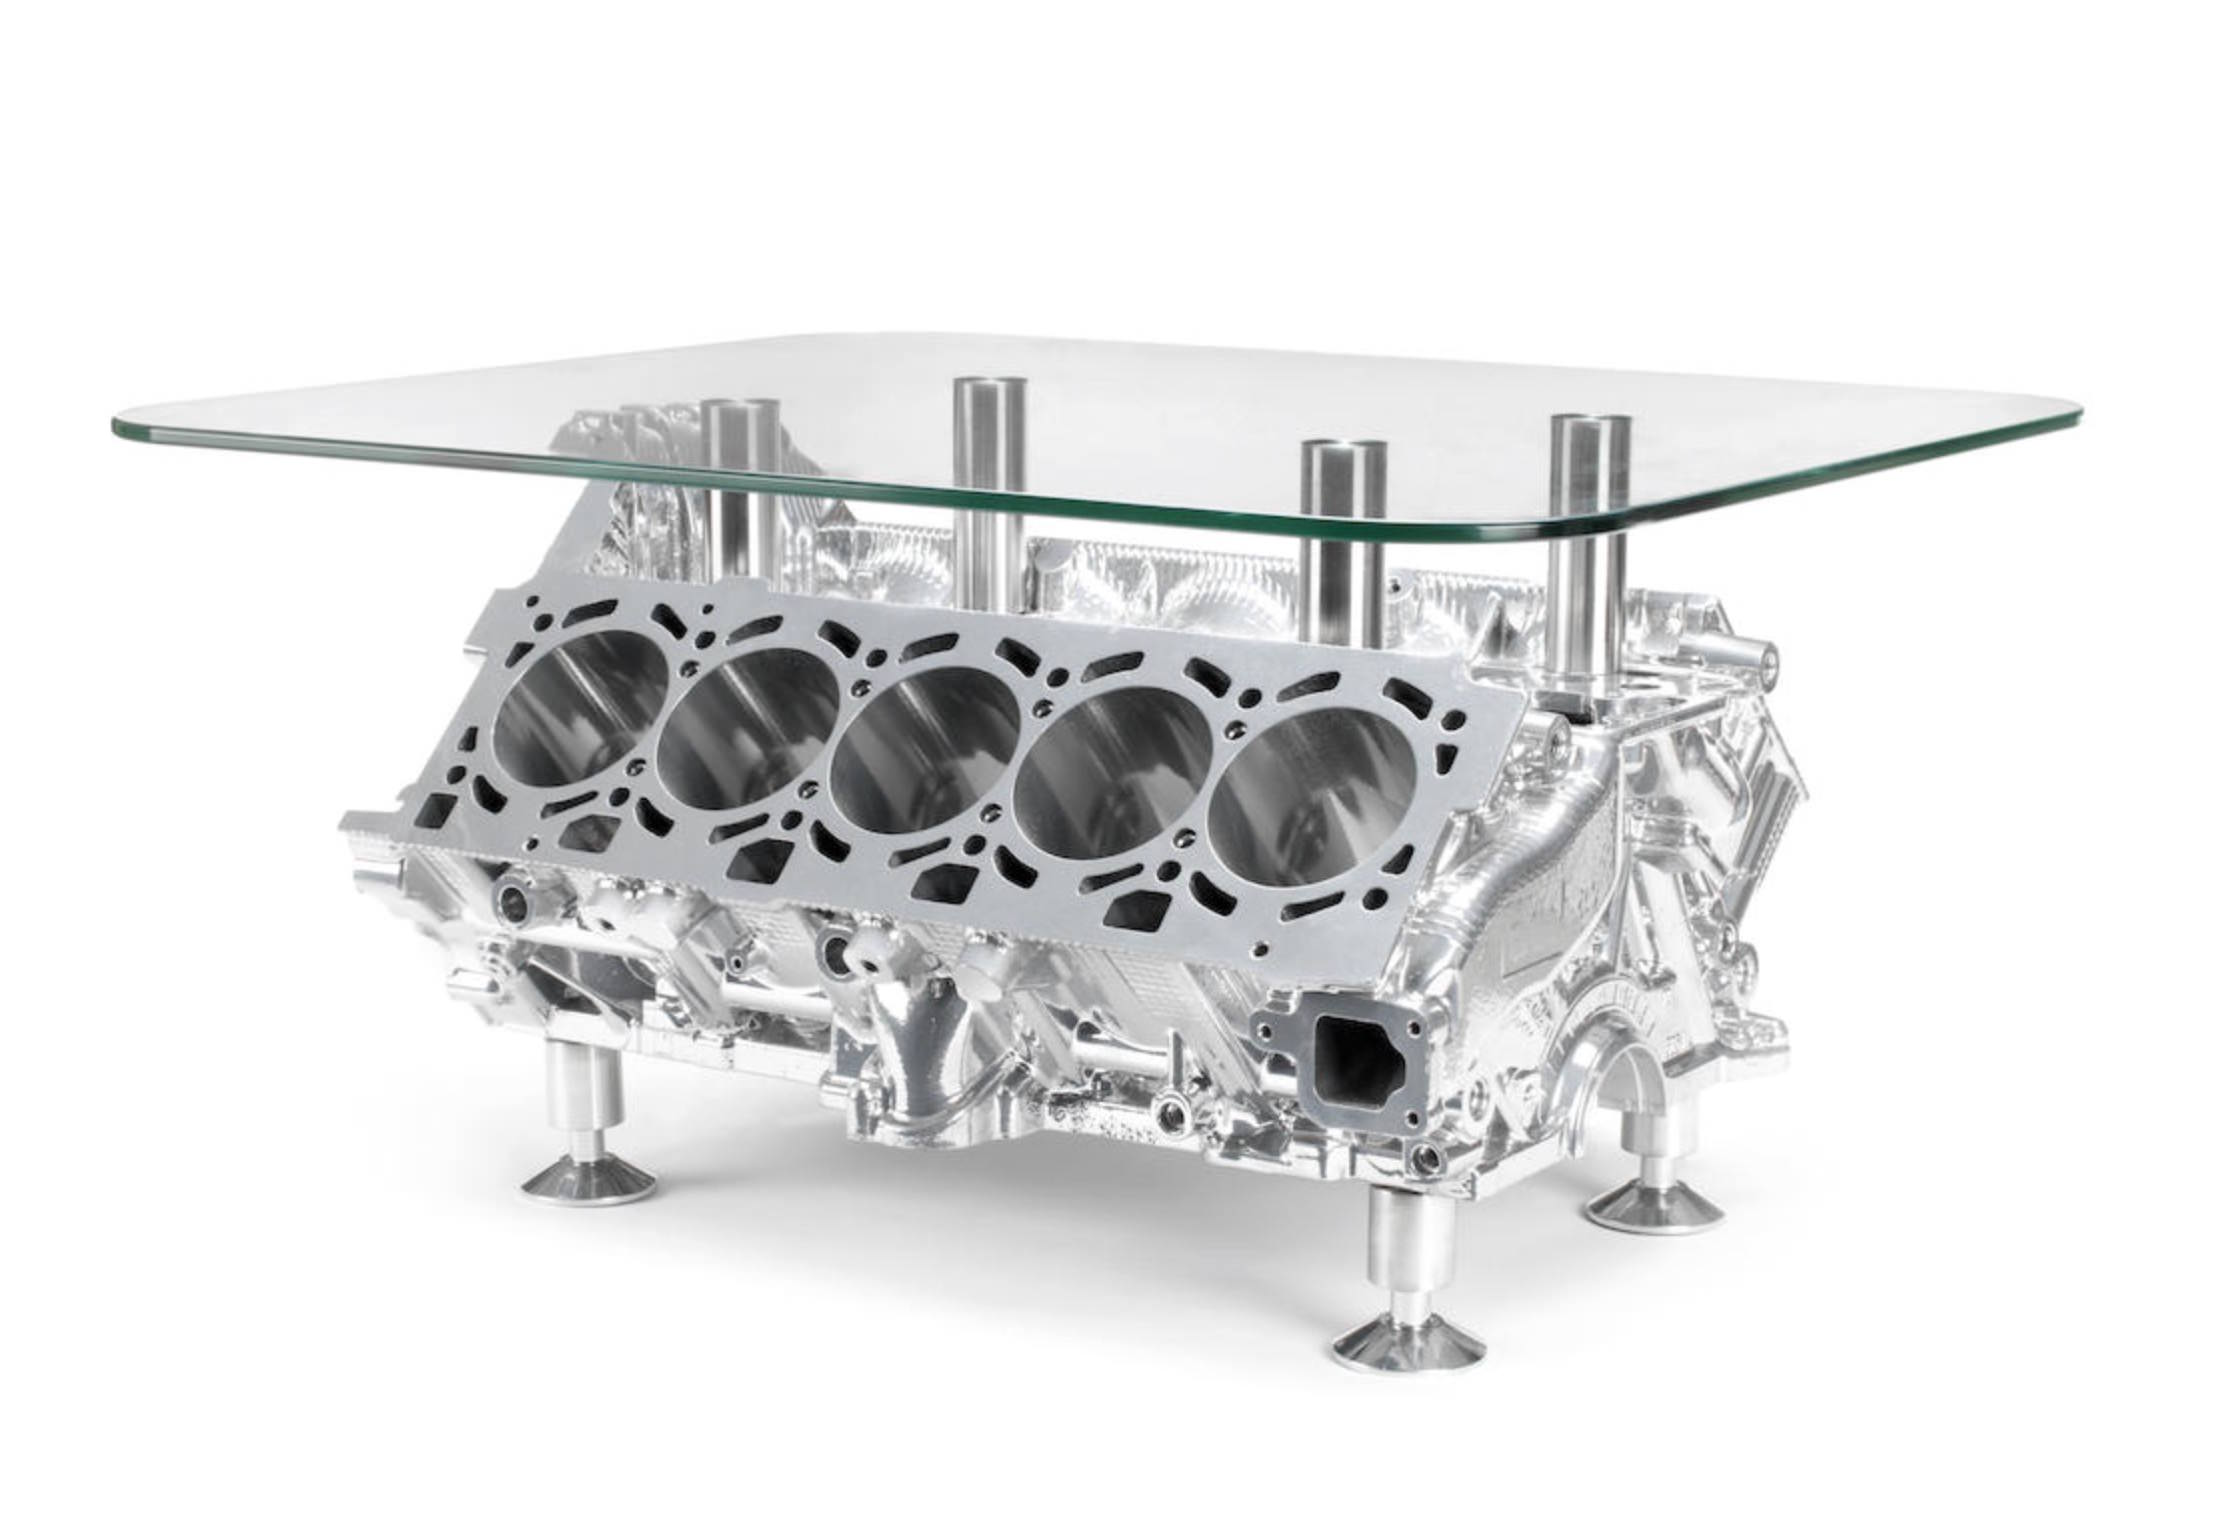 Certified Used Cars >> Lamborghini V10 Engine Coffee Table